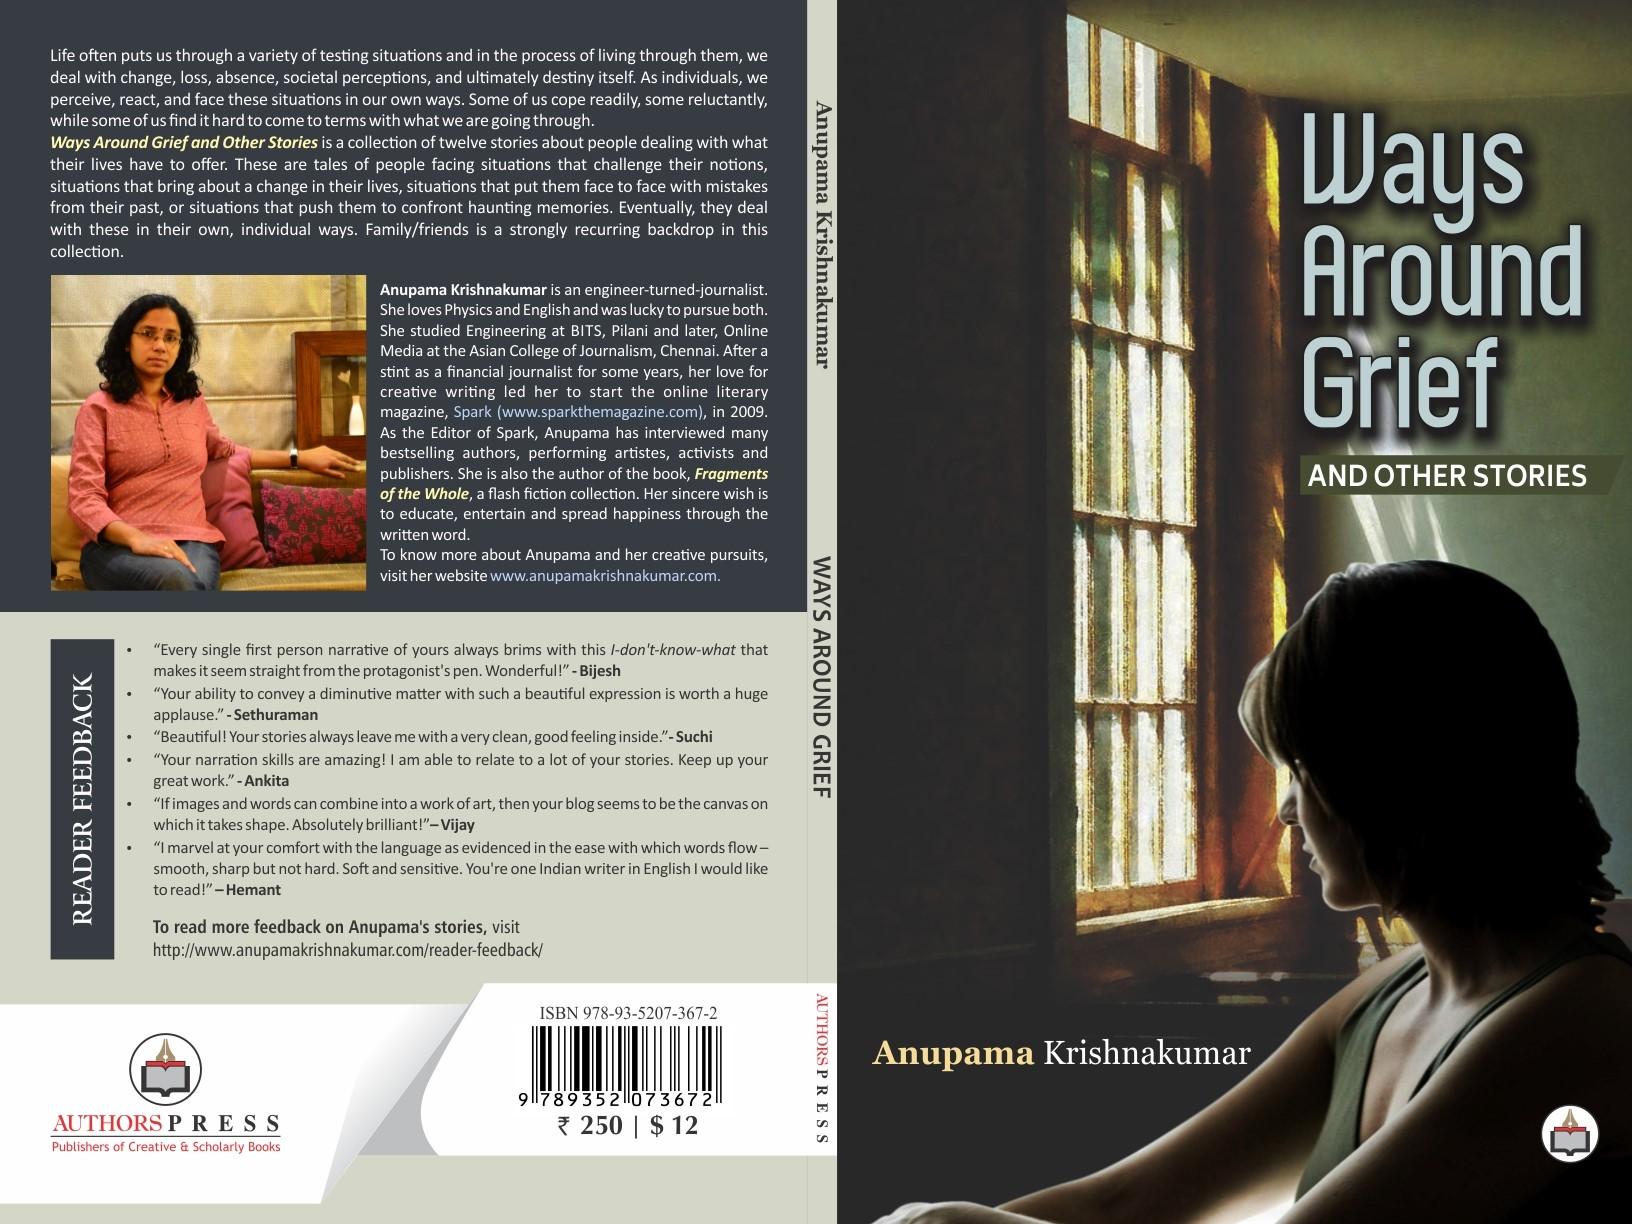 ways-around-grief-other-stories-anupama-krishnakumar-final